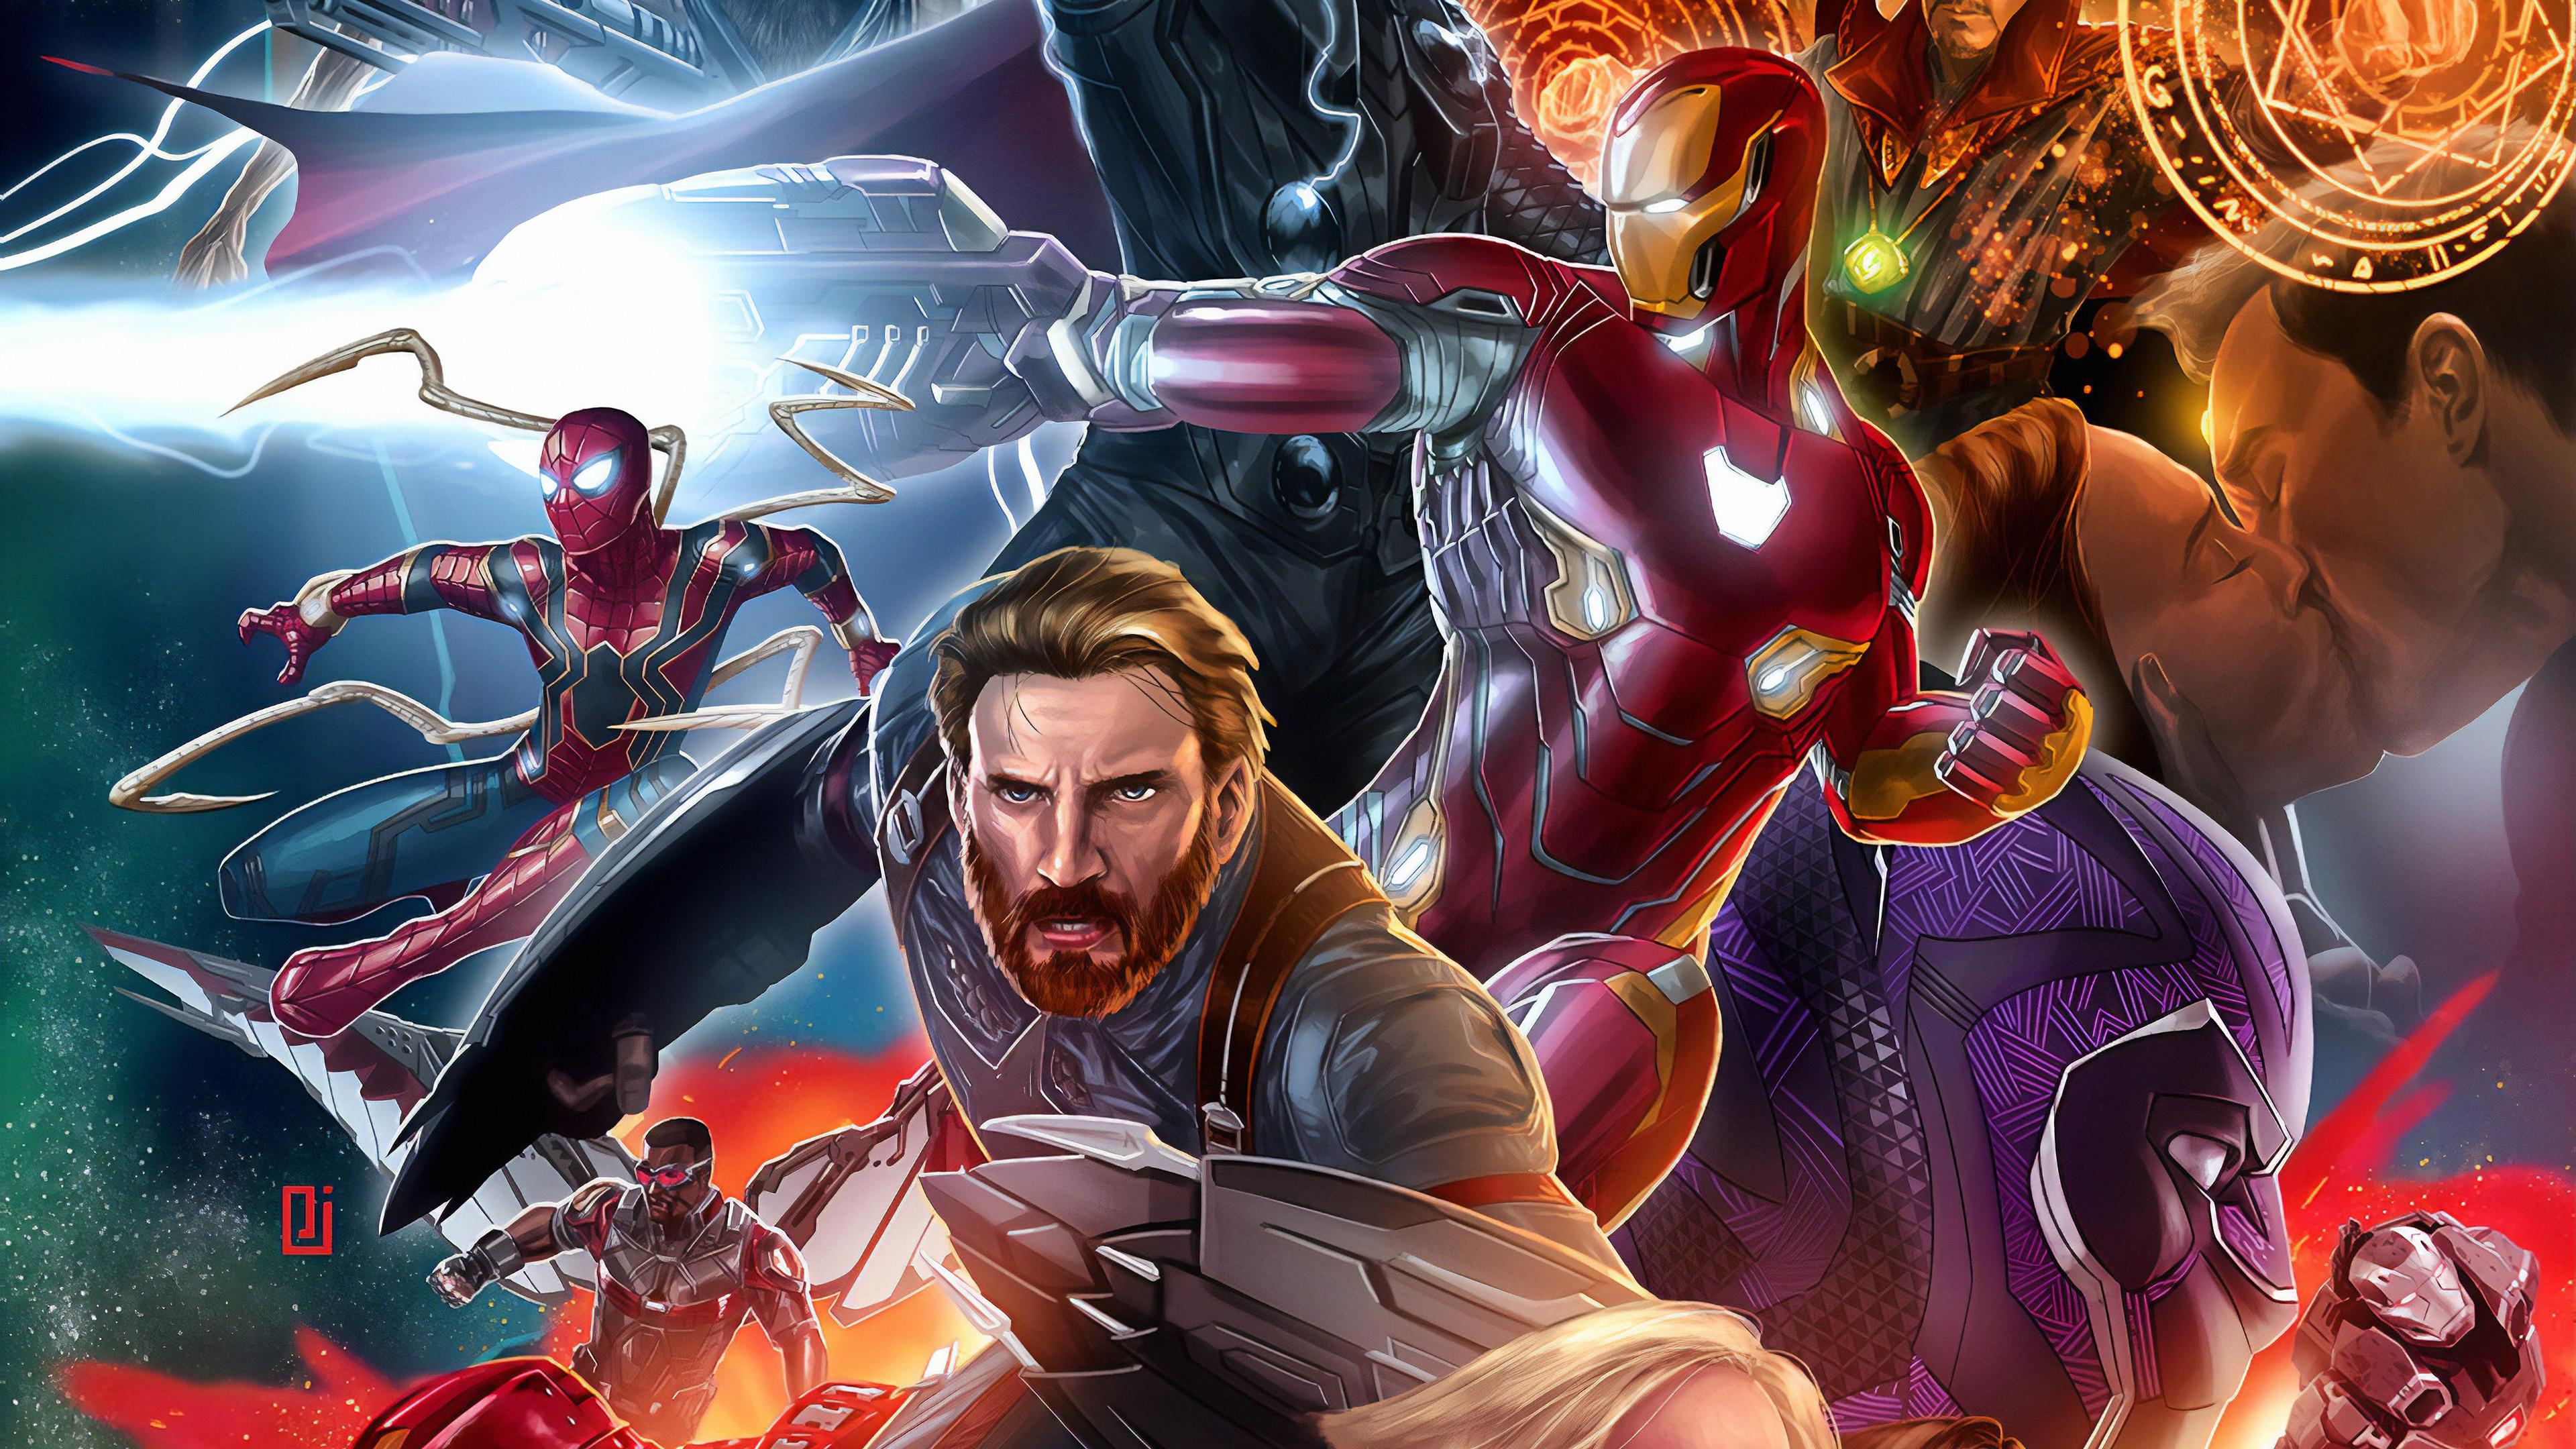 avenger assemble 1562105893 - Avenger Assemble - superheroes wallpapers, hd-wallpapers, avengers endgame wallpapers, artwork wallpapers, 4k-wallpapers